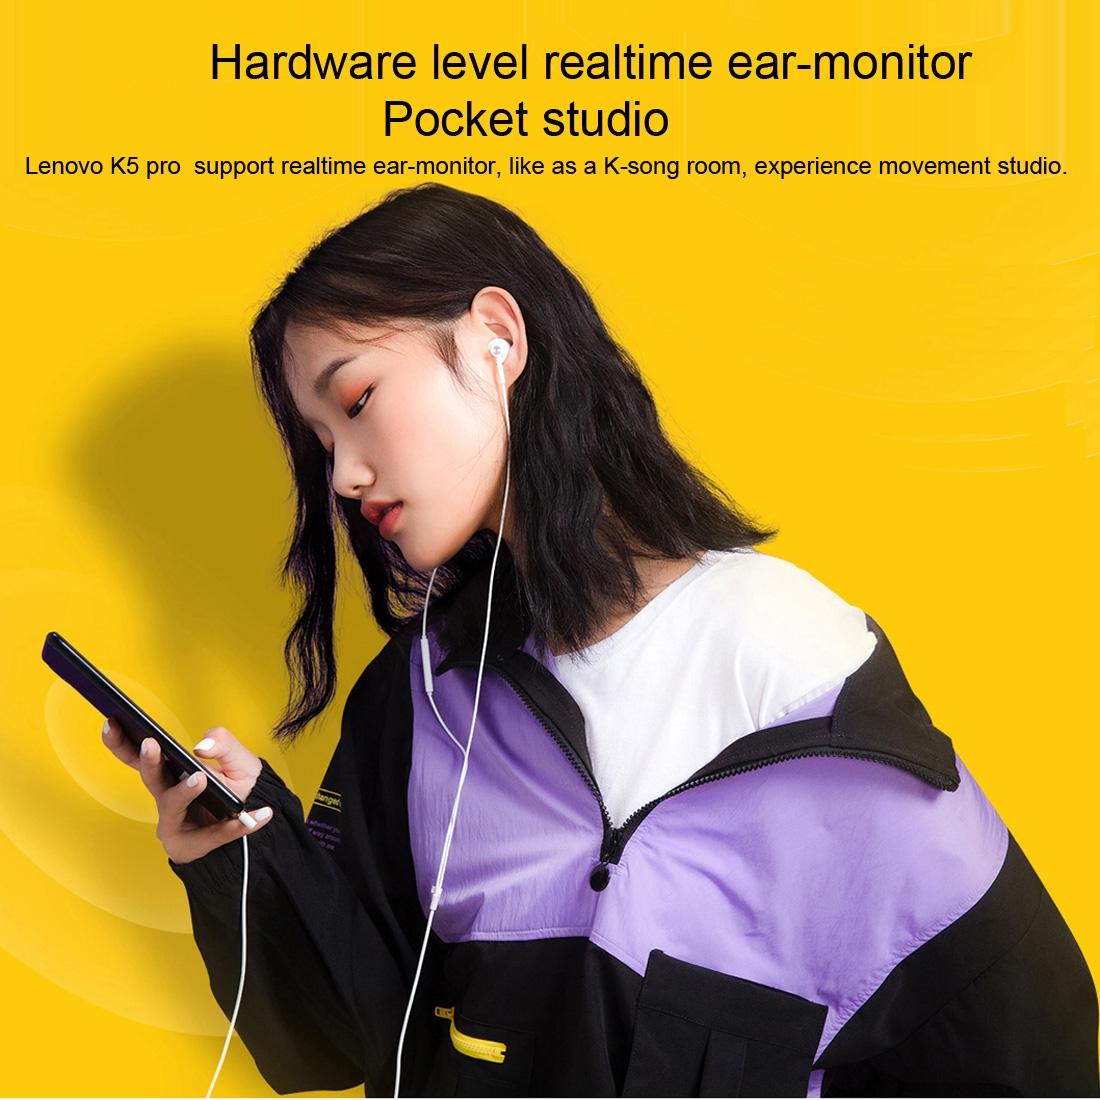 i.ibb.co/Y7kDR7B/Smartphone-6-GB-64-GB-Lenovo-K5-Pro-Preto-18.jpg